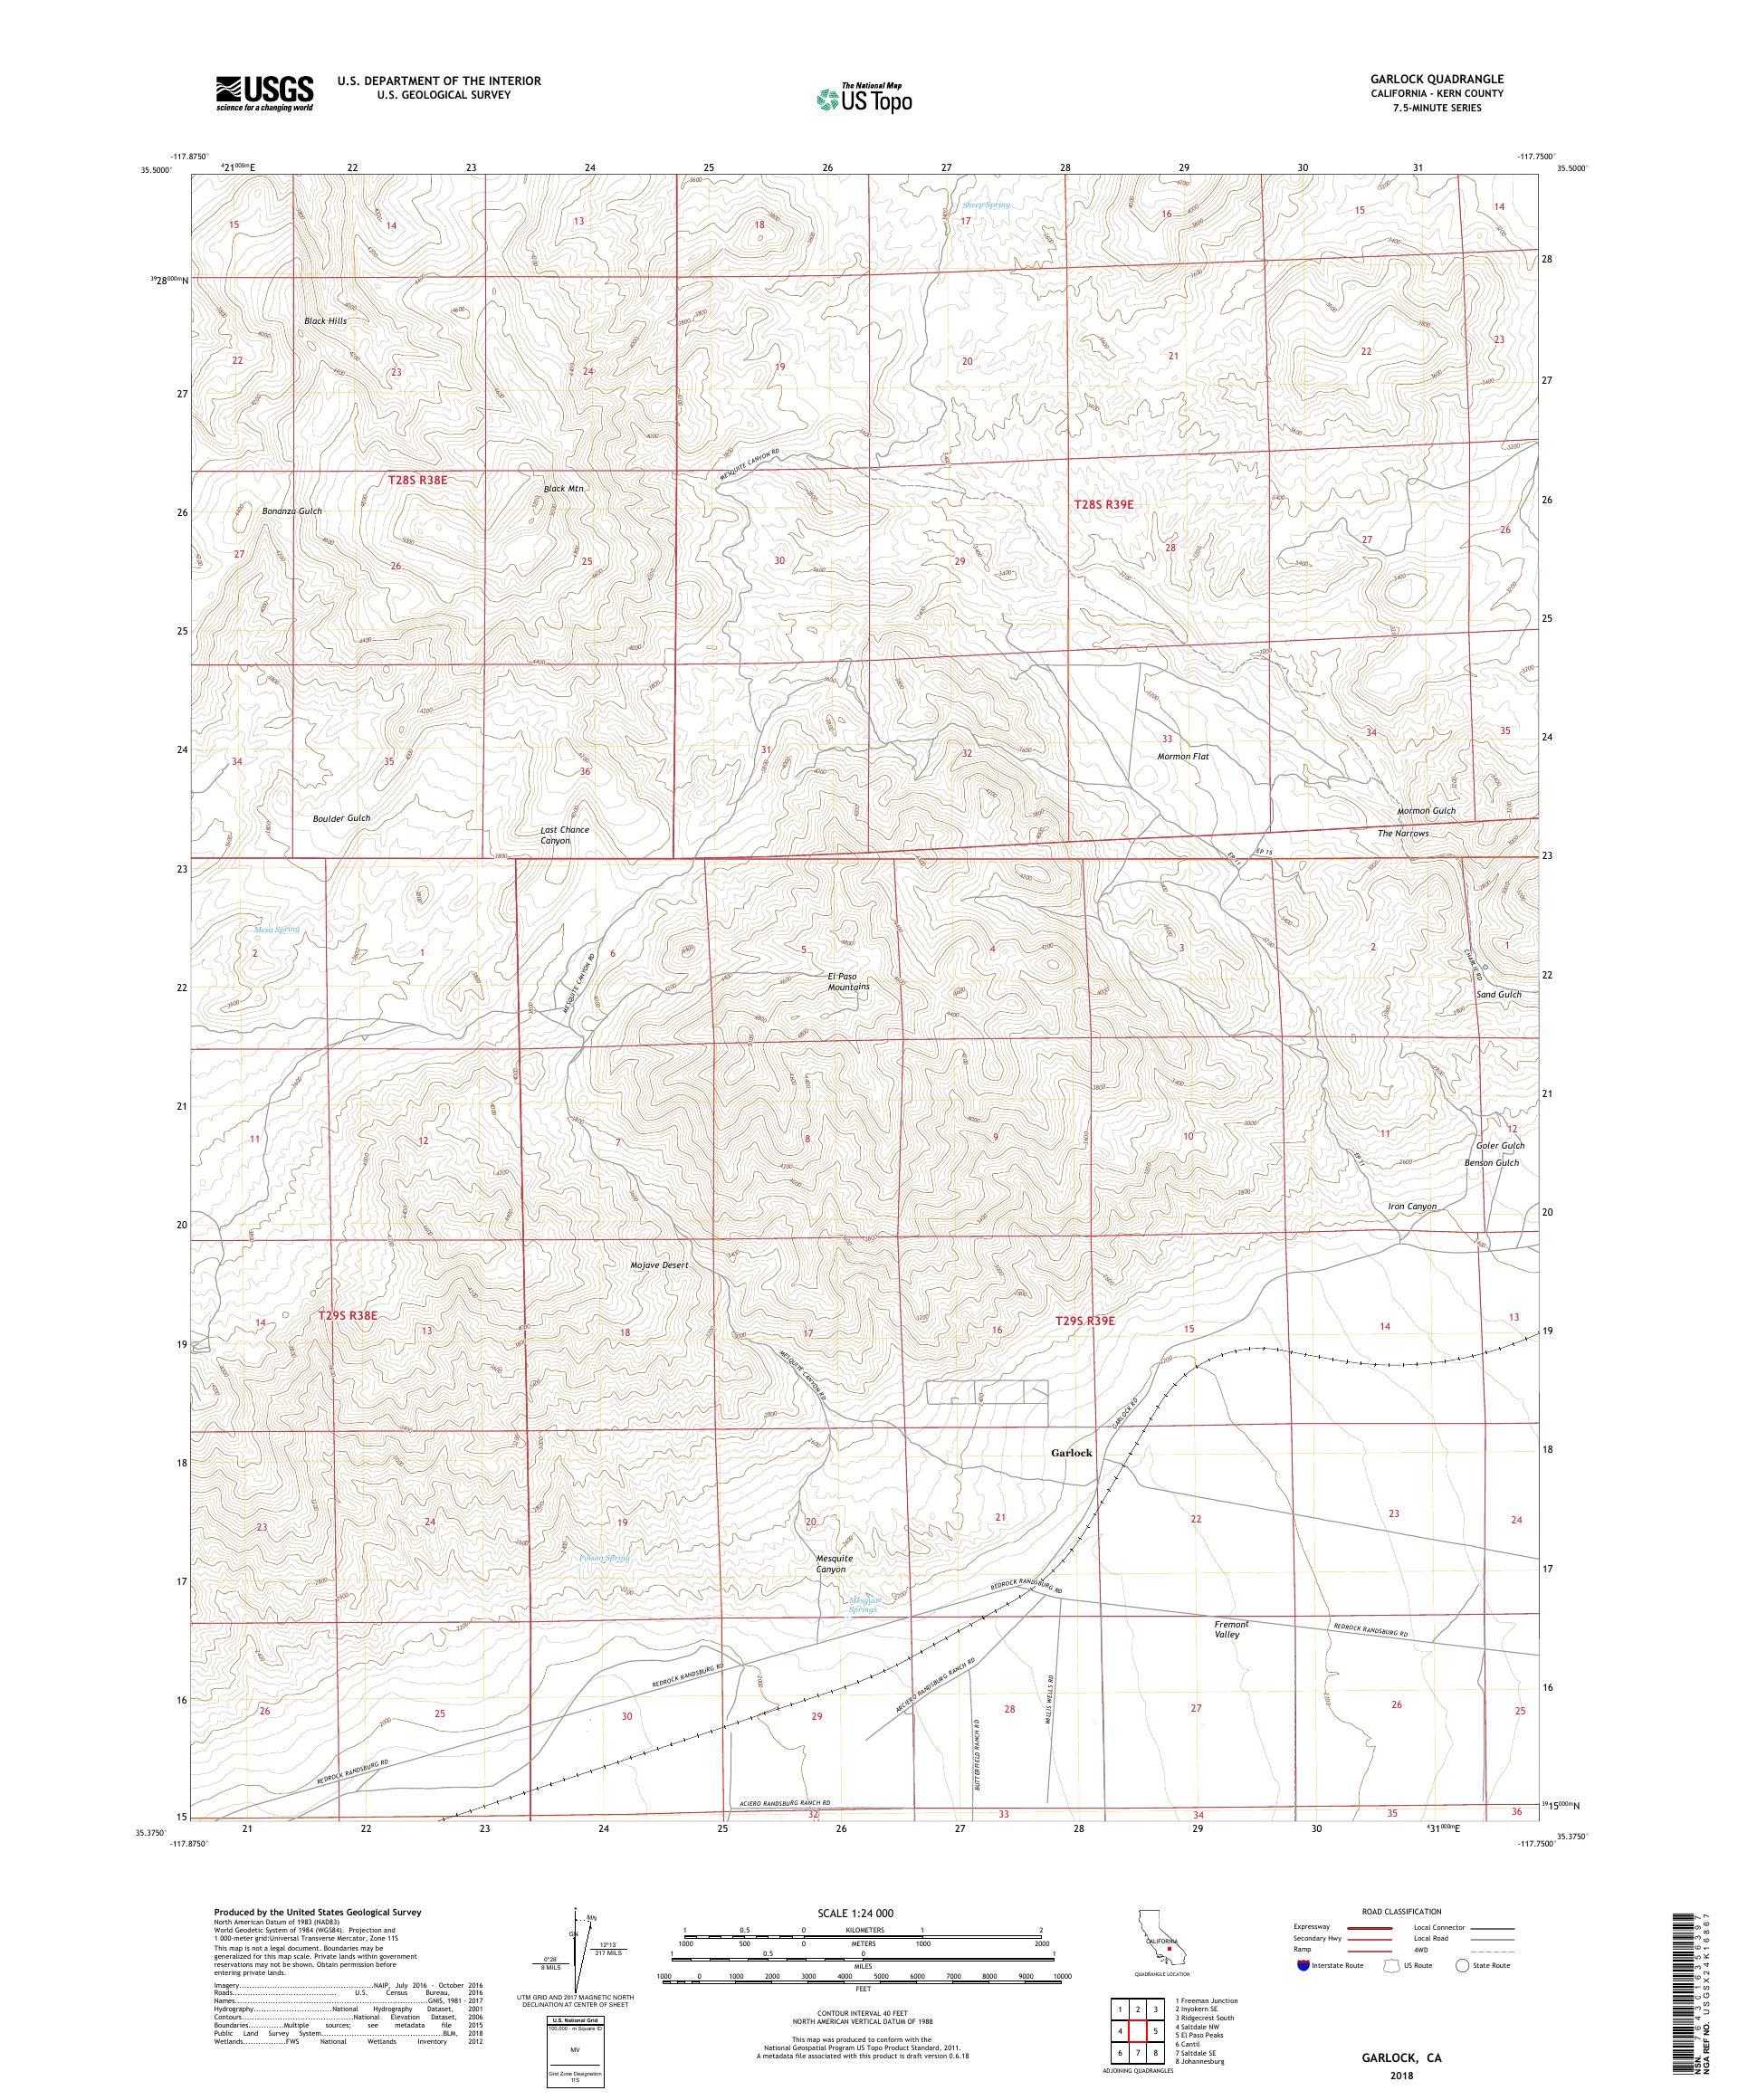 MyTopo Garlock, California USGS Quad Topo Map